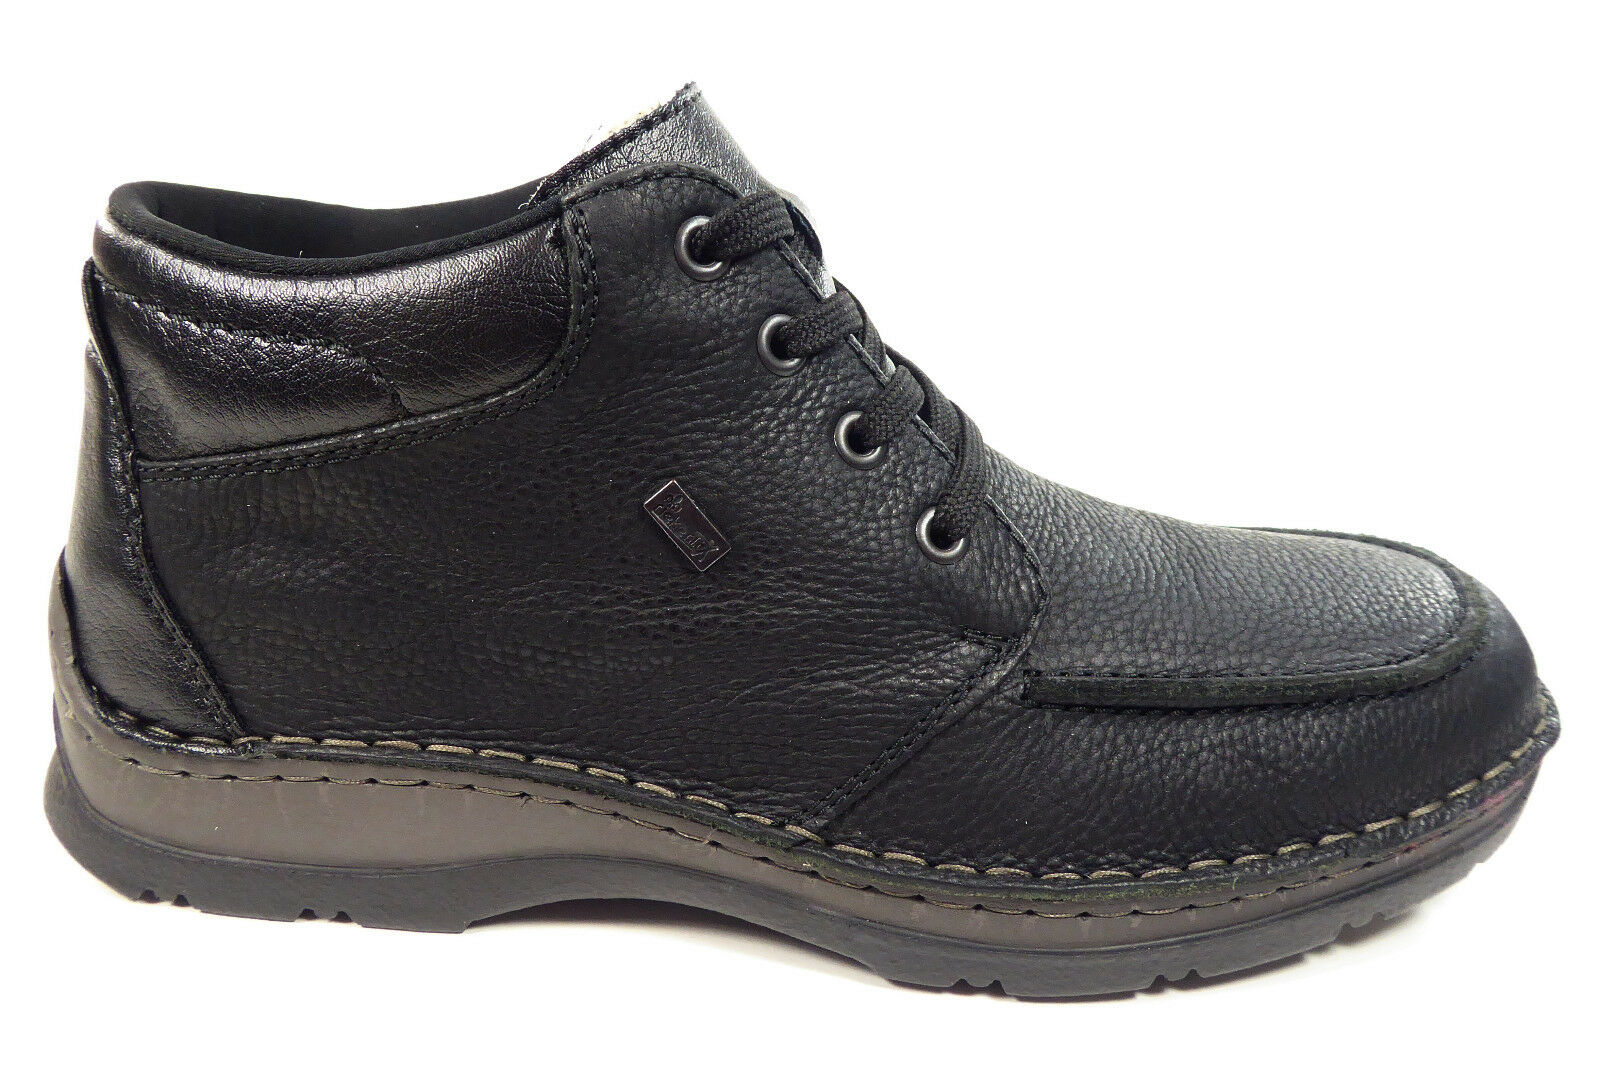 Rieker Herrenschuhe Stiefeletten Boots mit Tex-Membran in Schwarz 05332-01